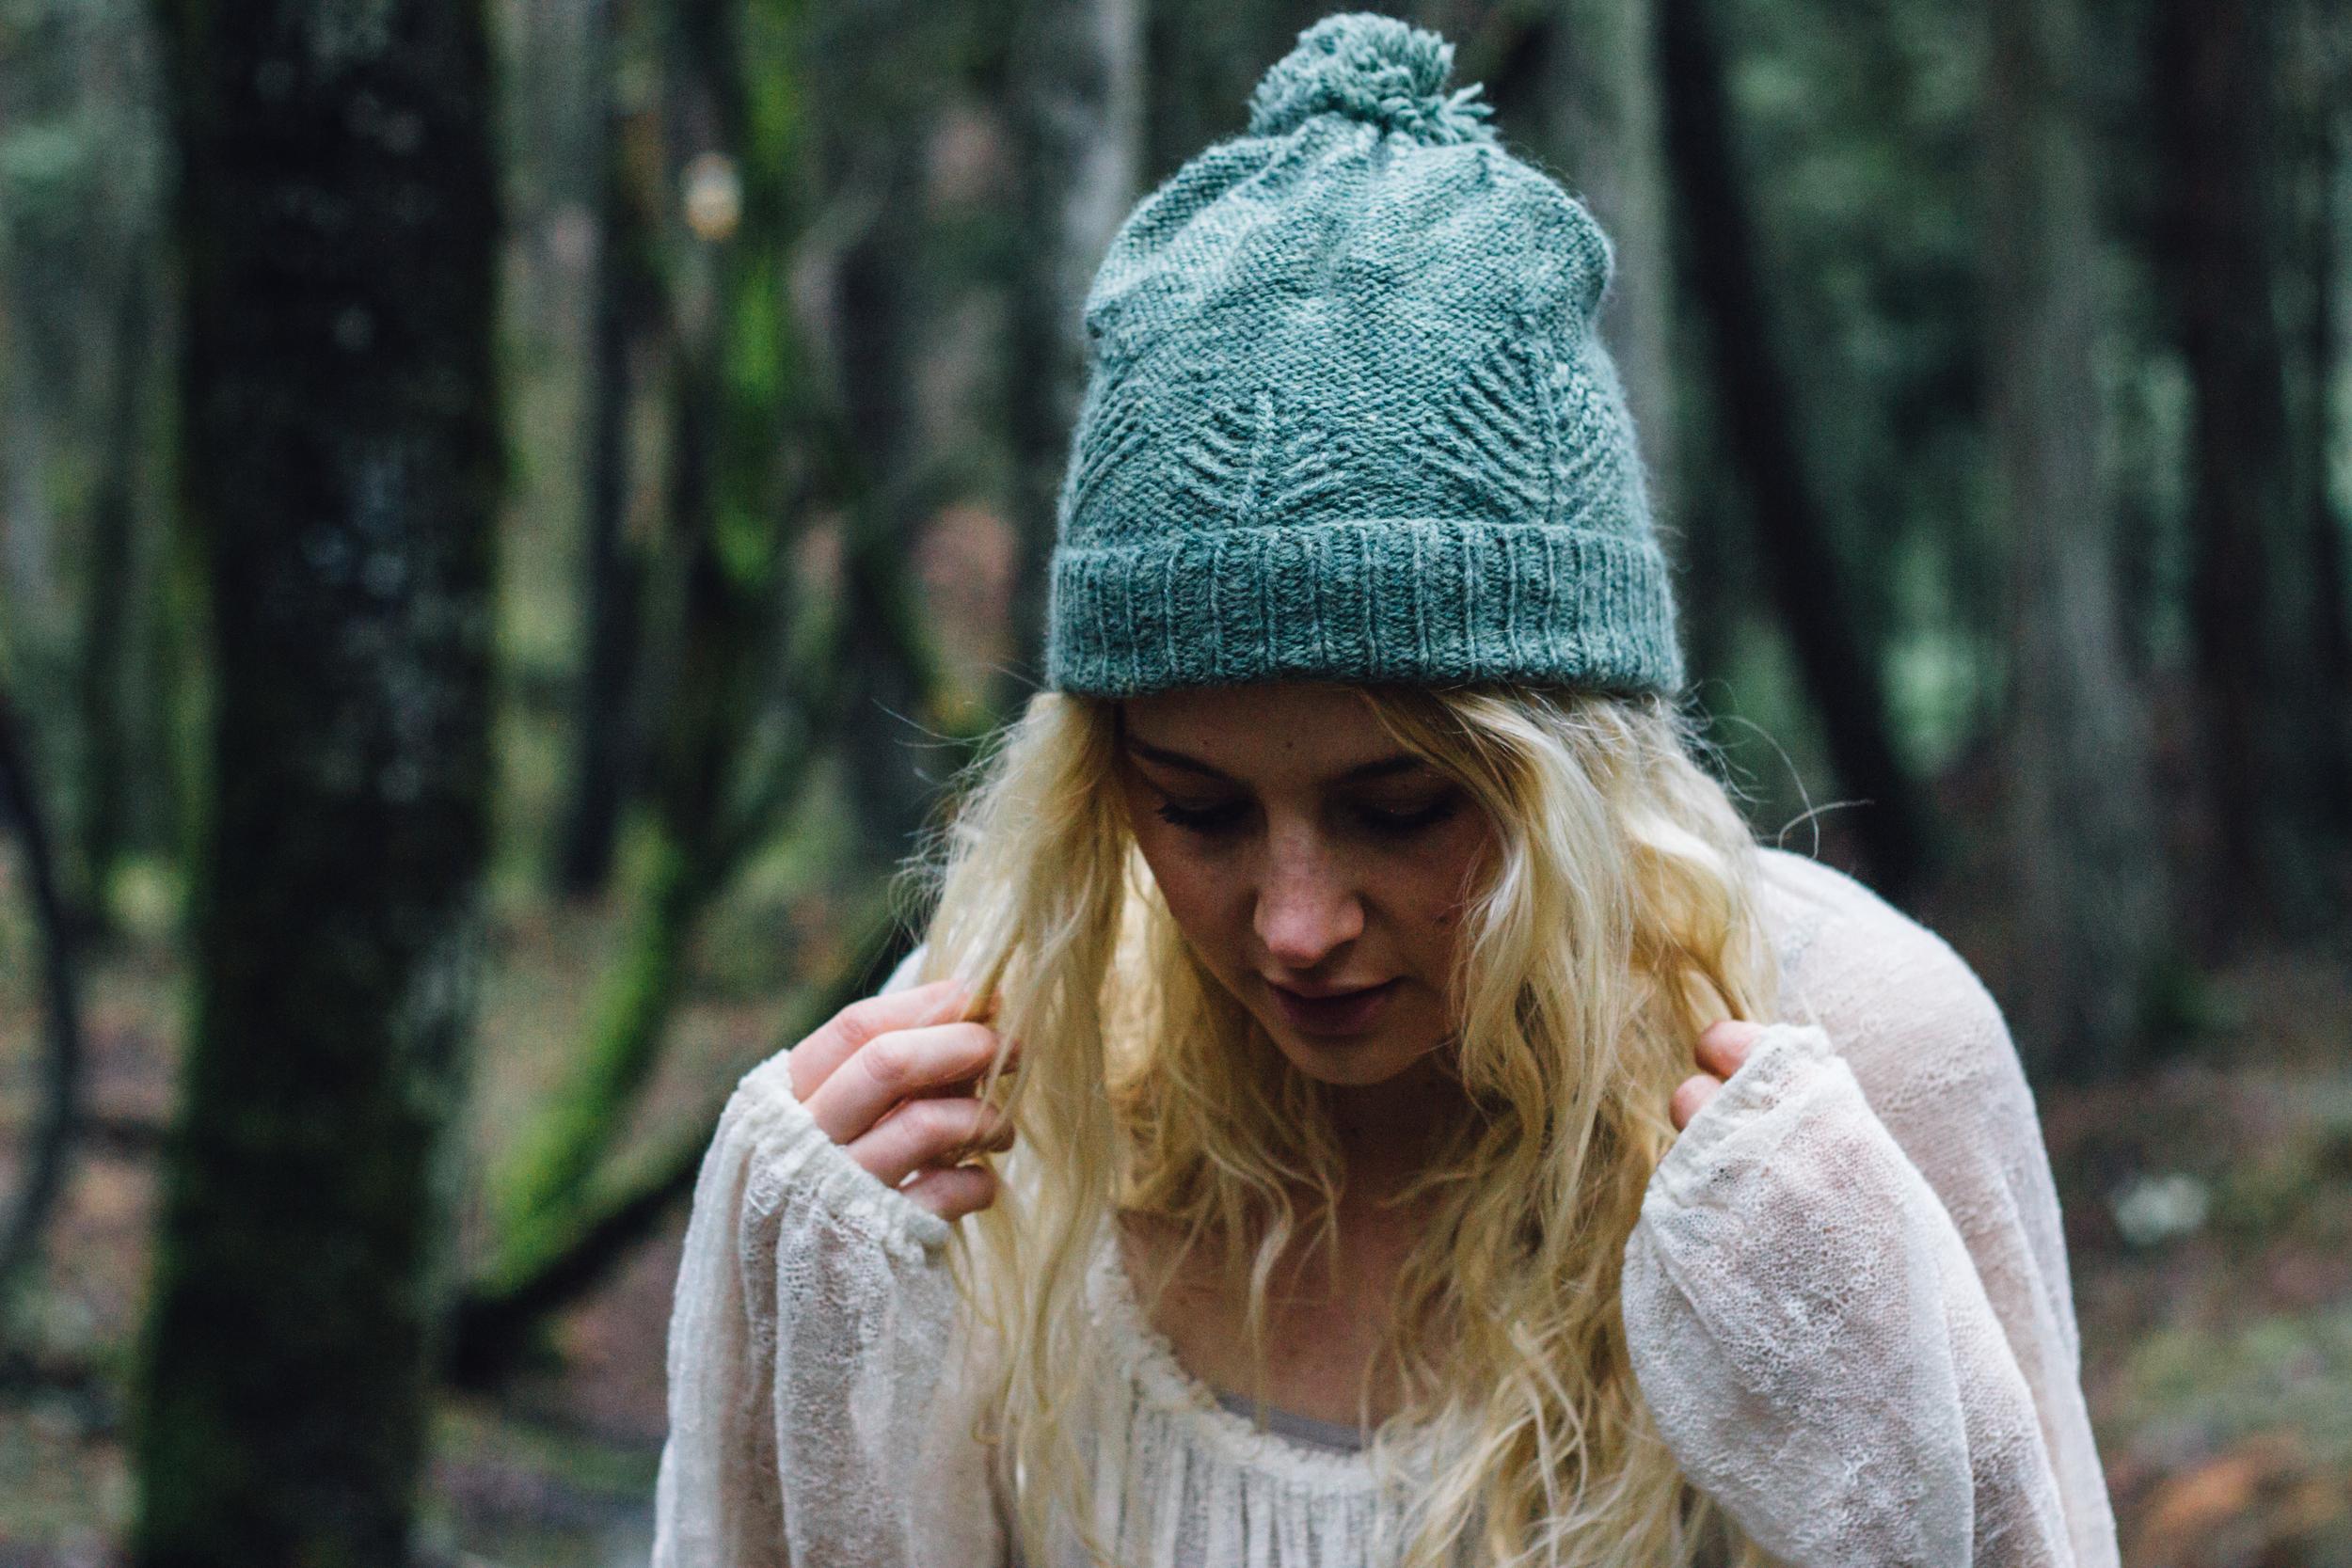 Treehouse hat